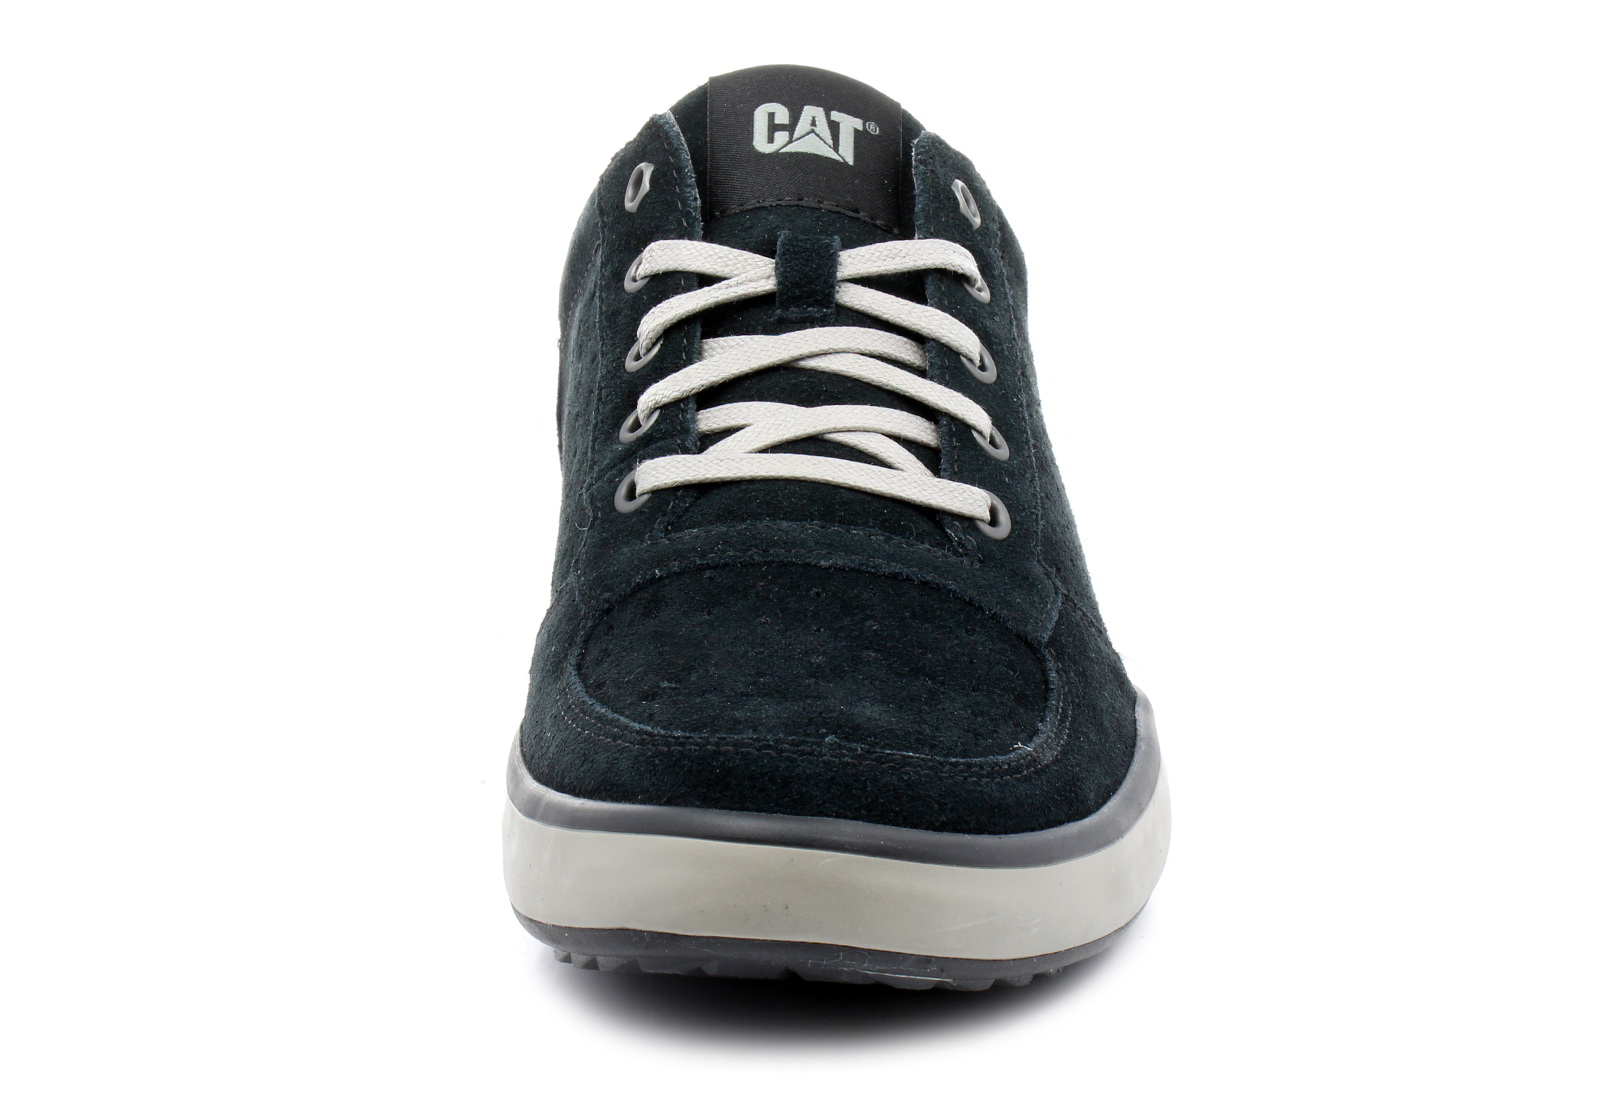 a6c3ee21f28 Cat Nízké Boty - Sway - 723291-blkTenisky